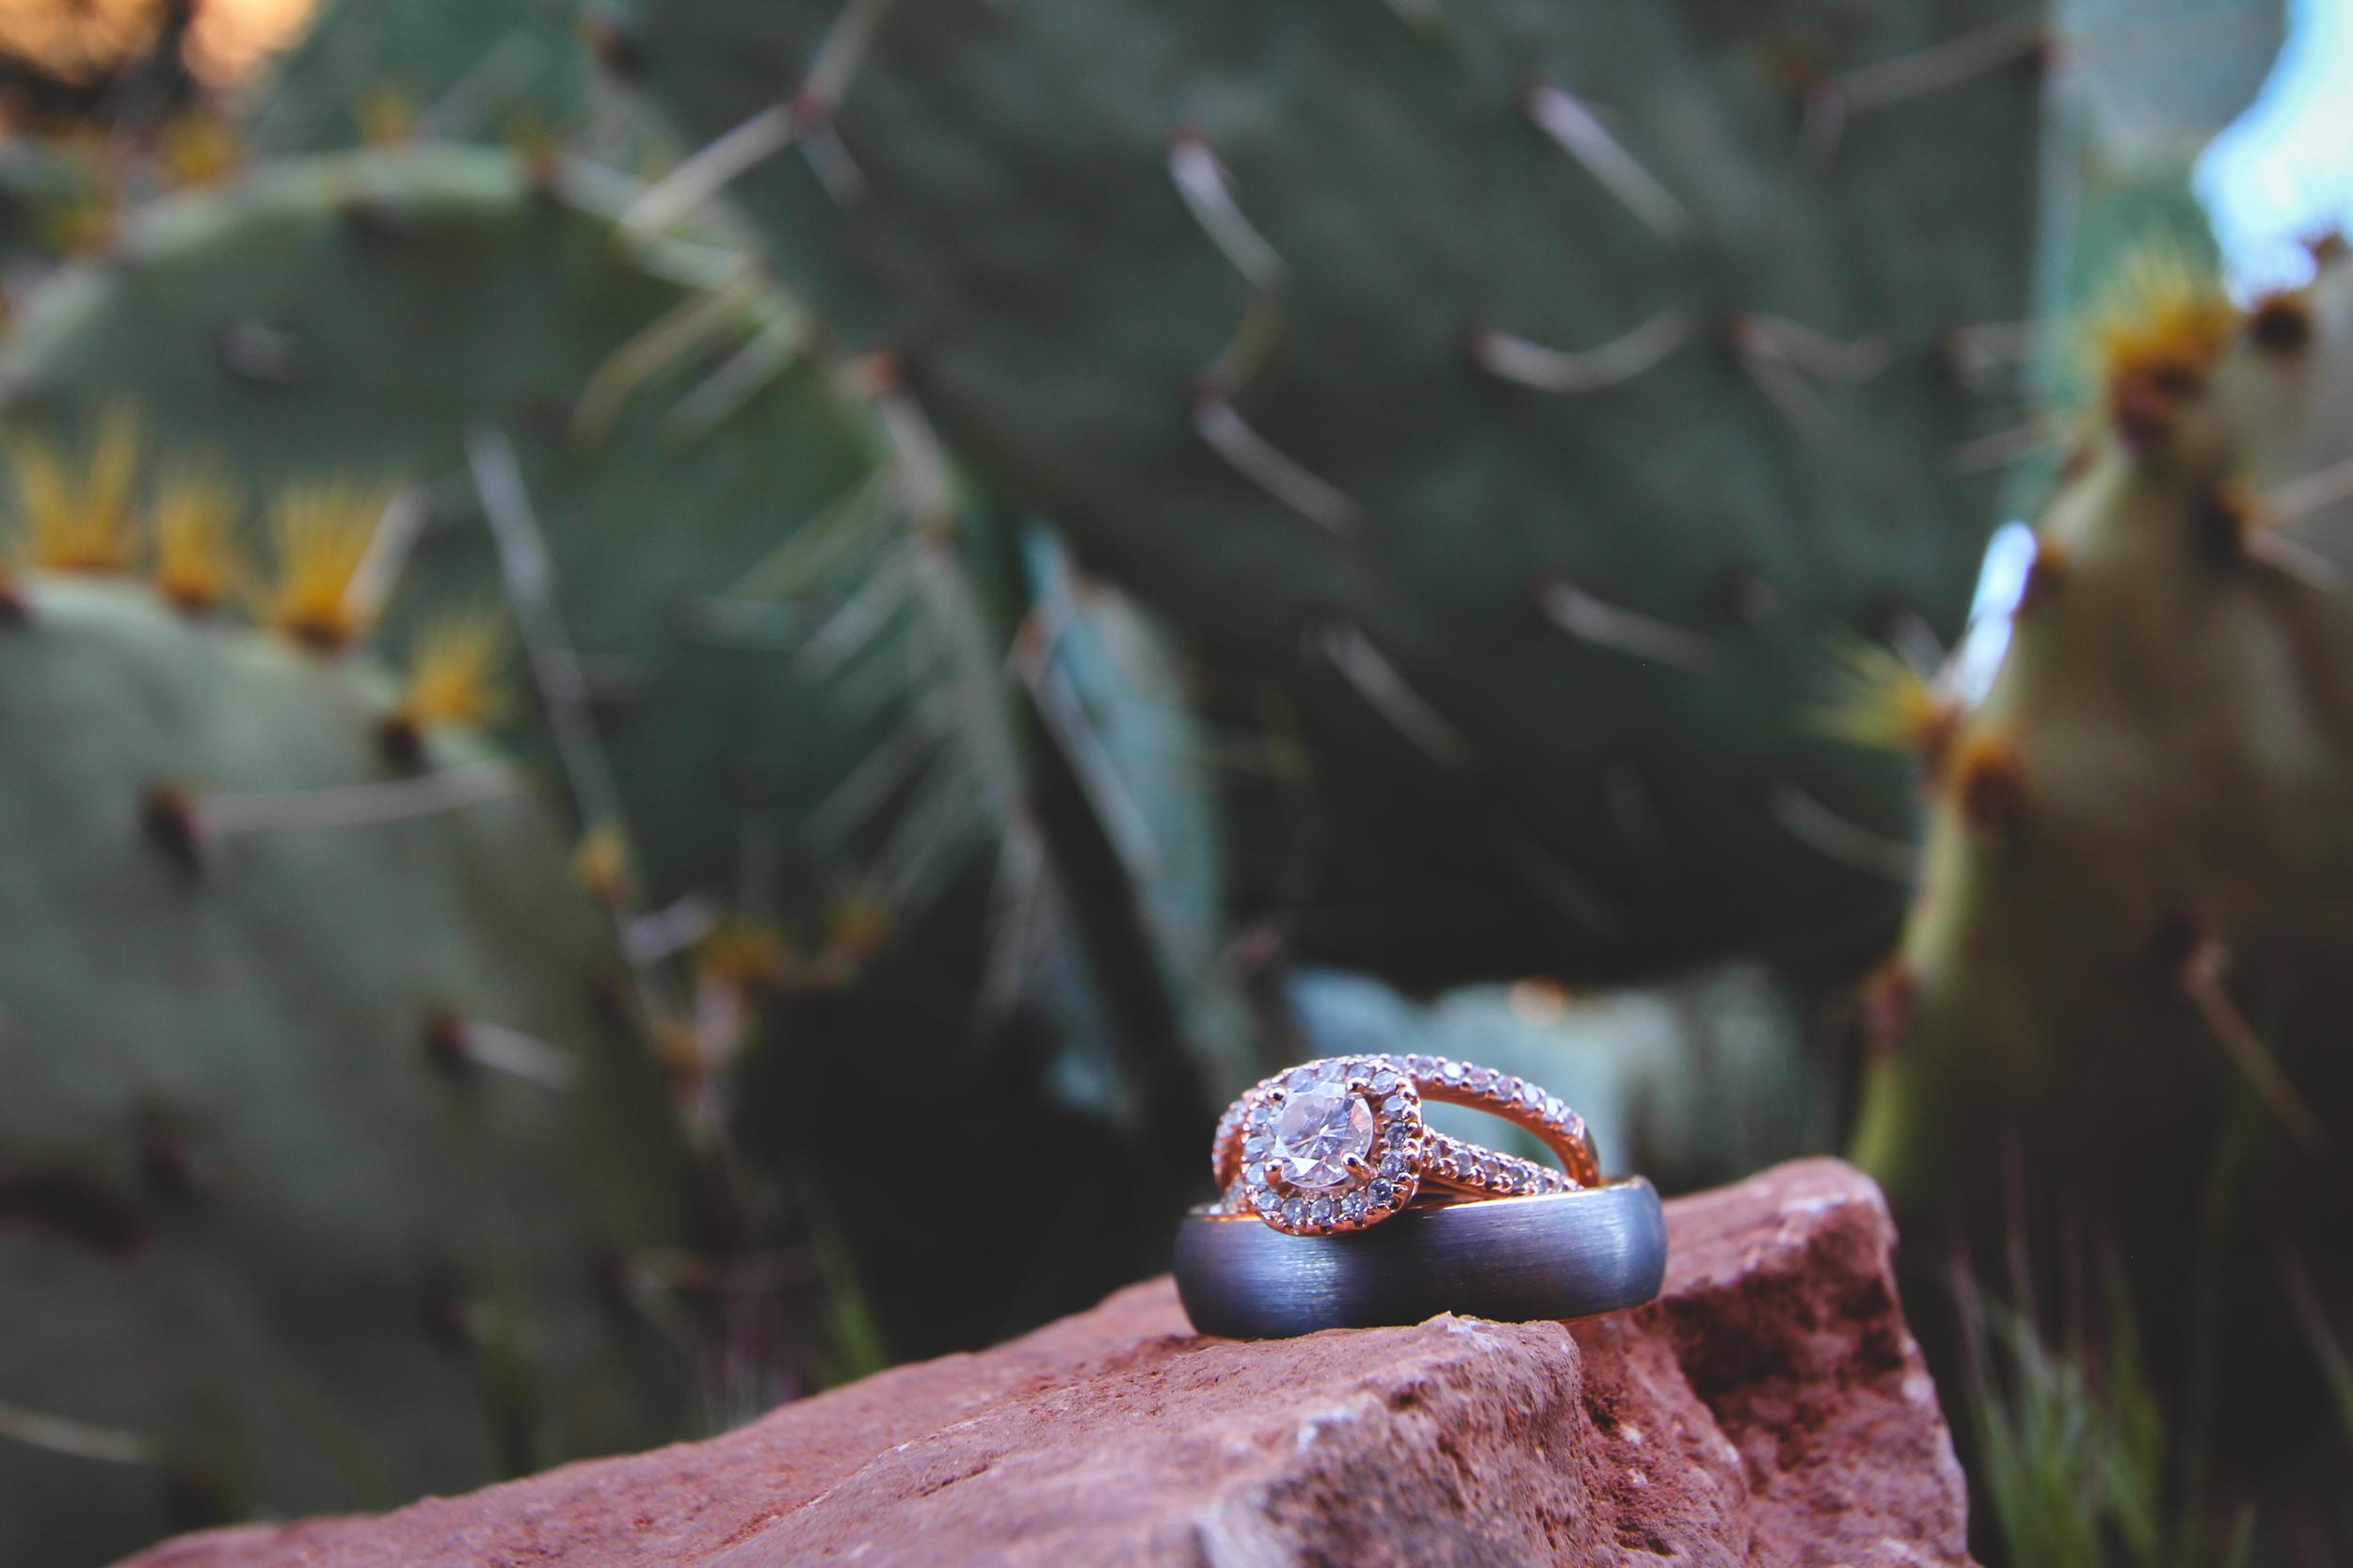 Honeymoon_Arizona_JonCourvillePhotography-10.jpg